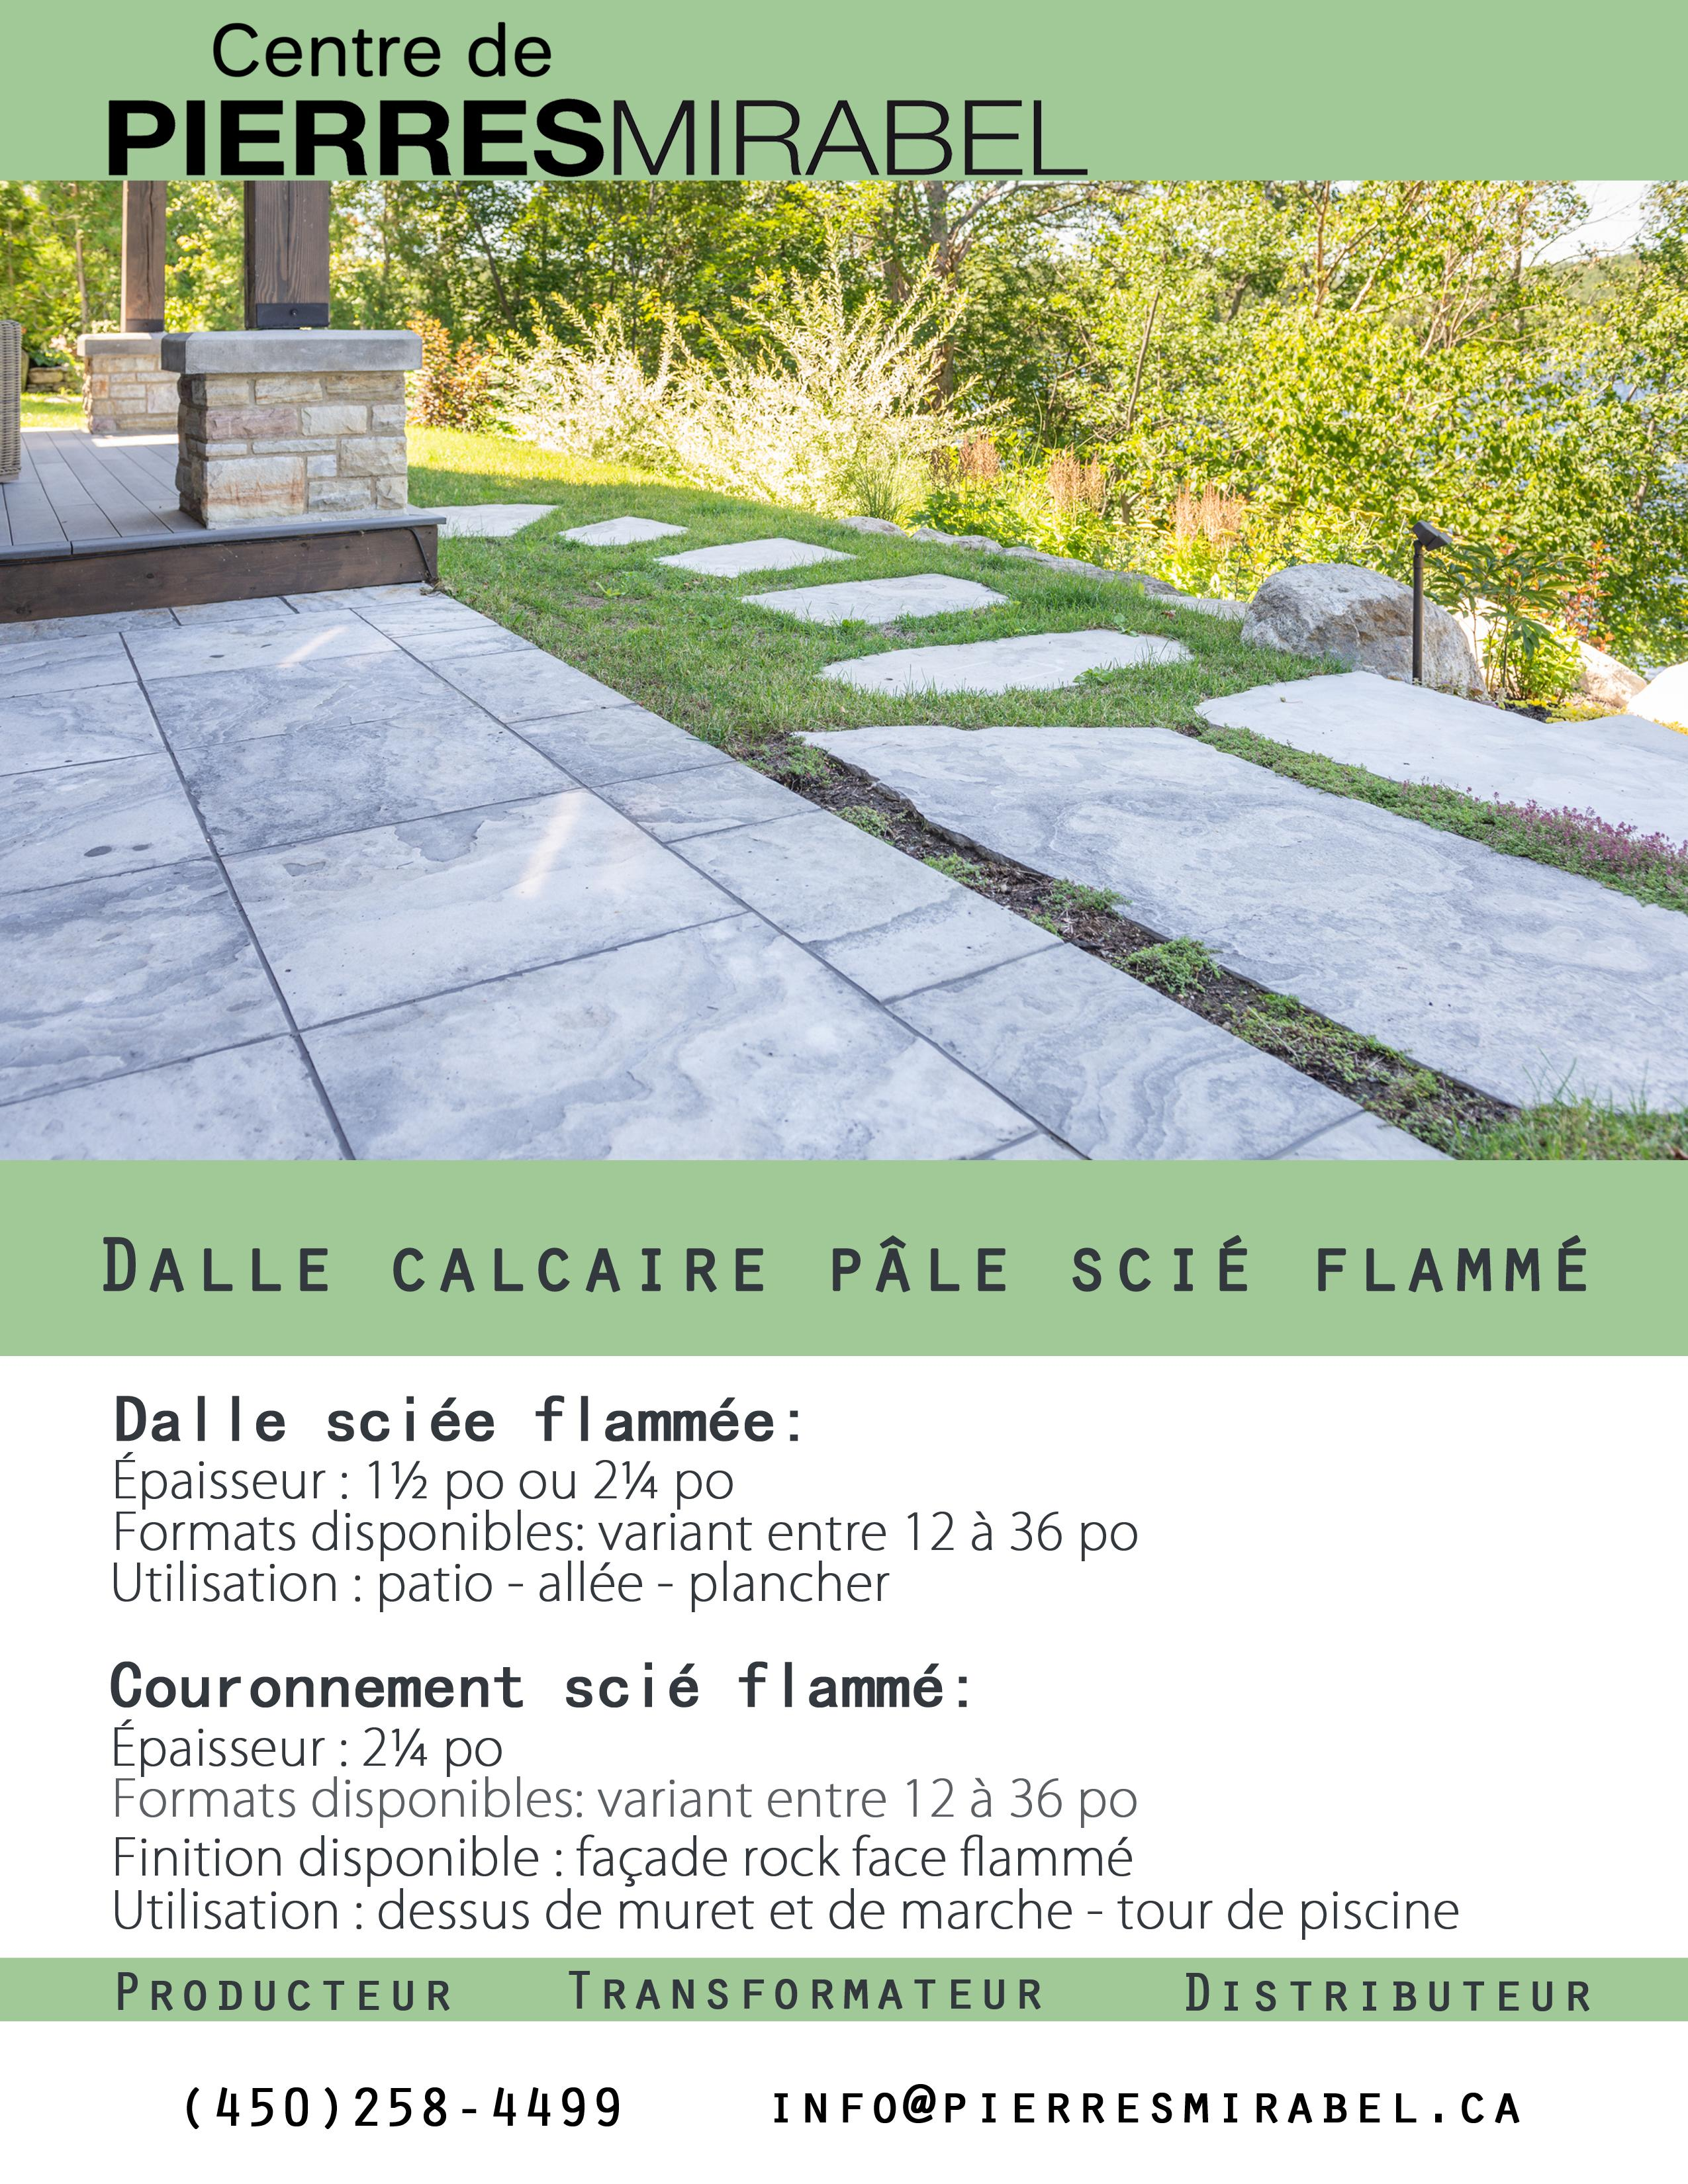 calcaire-pale-scie-flamme.jpg